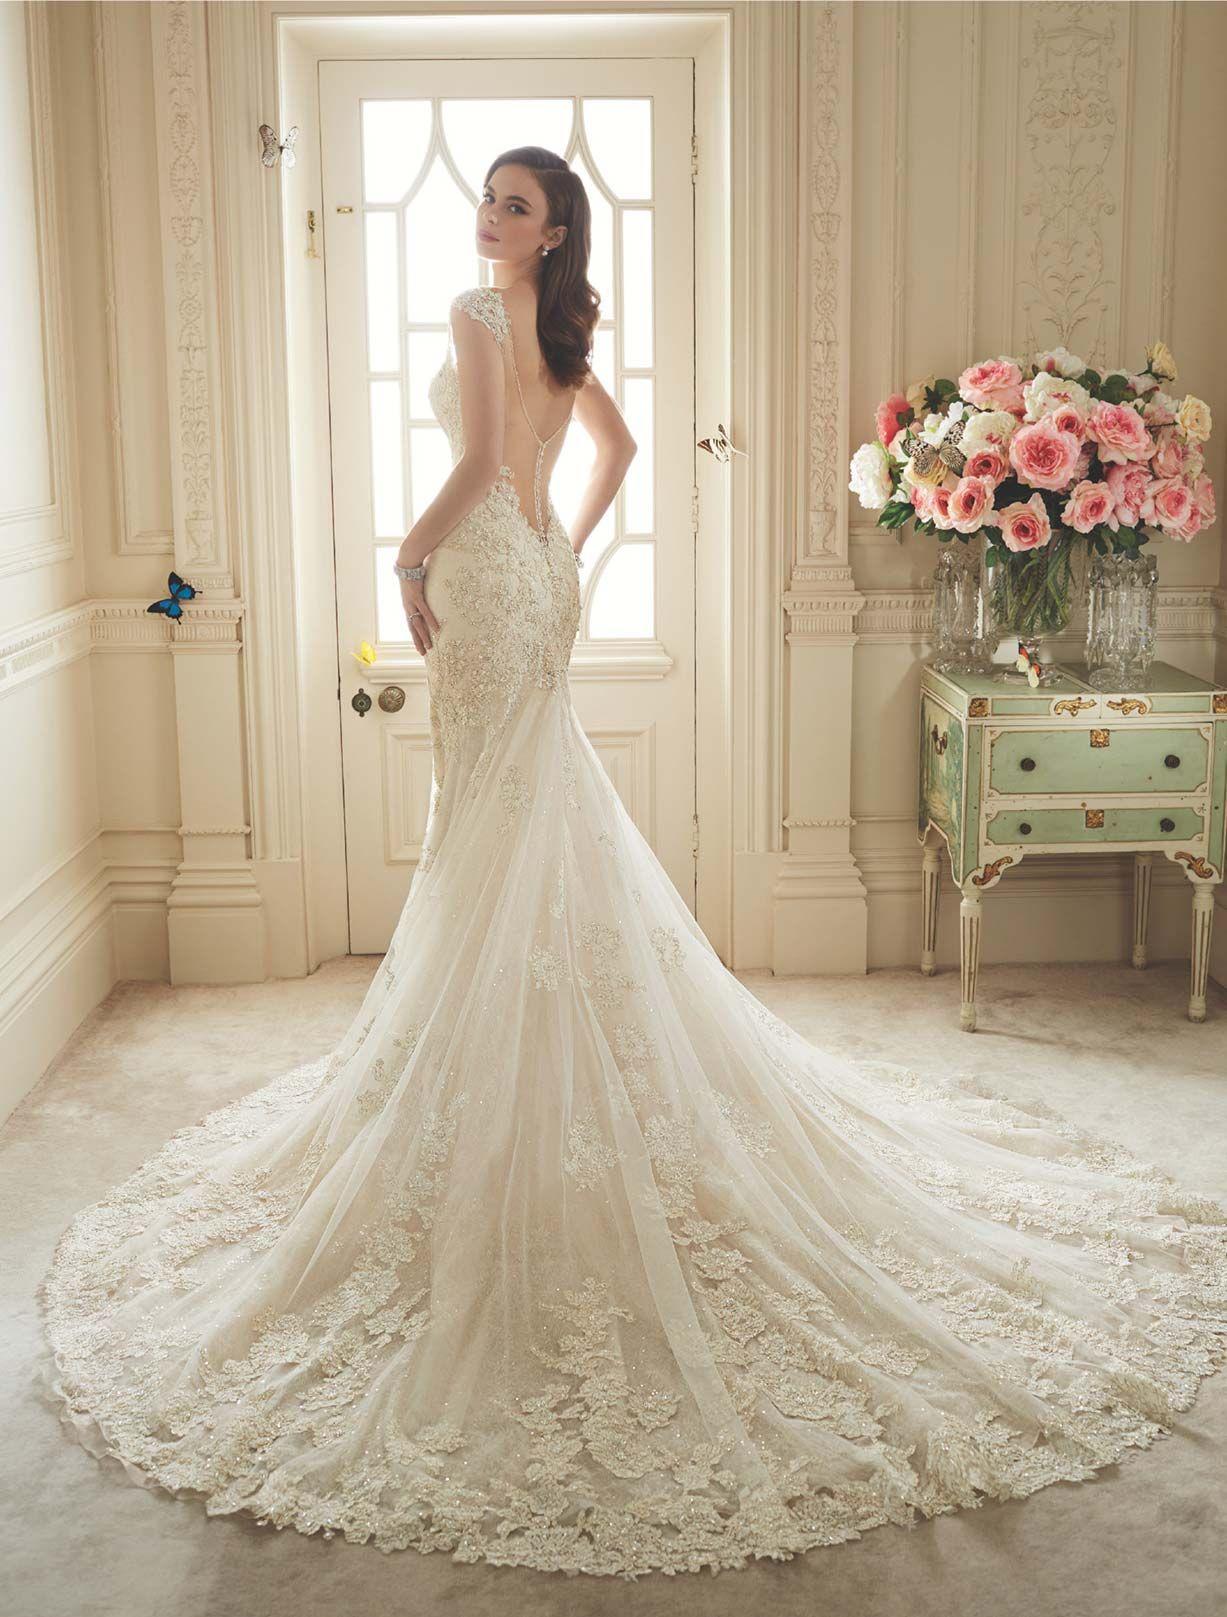 Back detail wedding dress  Sophia Tolli Sultana back view  Váy cưới  Pinterest  Wedding